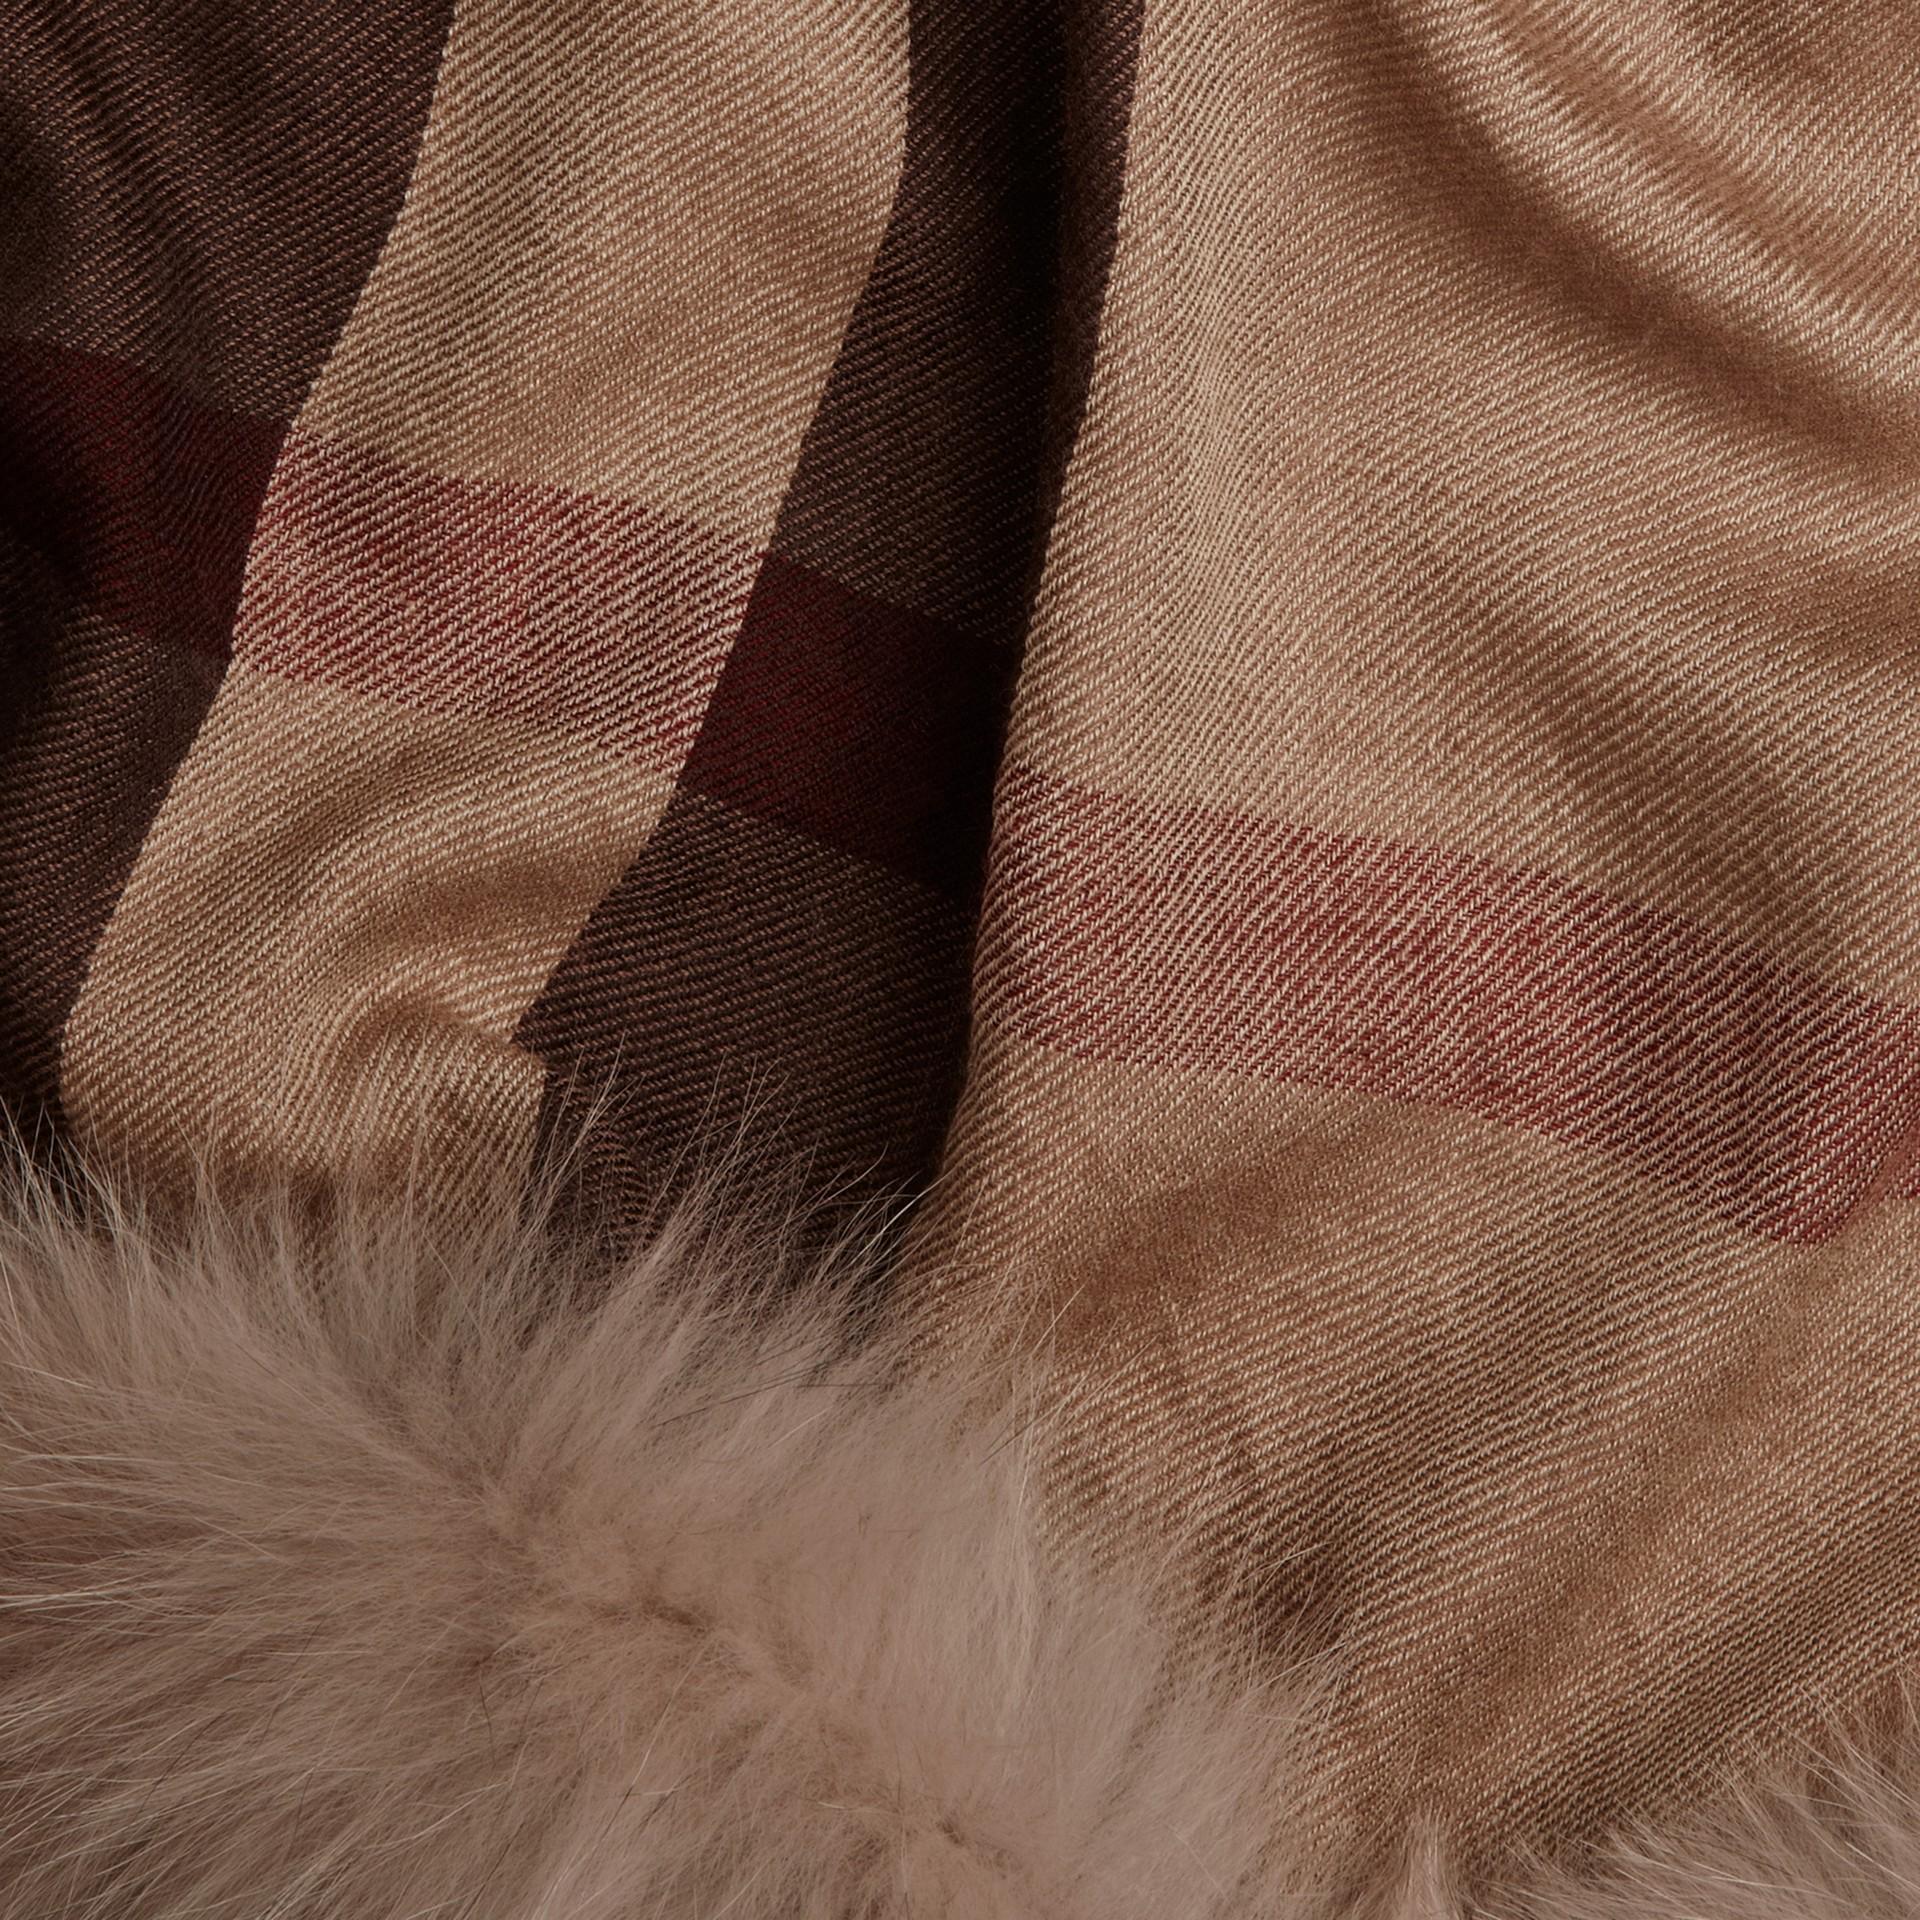 Smoked check-muster in trenchfarben Kaschmirschal in Check mit Pelzbesatz Smoked Check-muster  Trenchfarben - Galerie-Bild 2